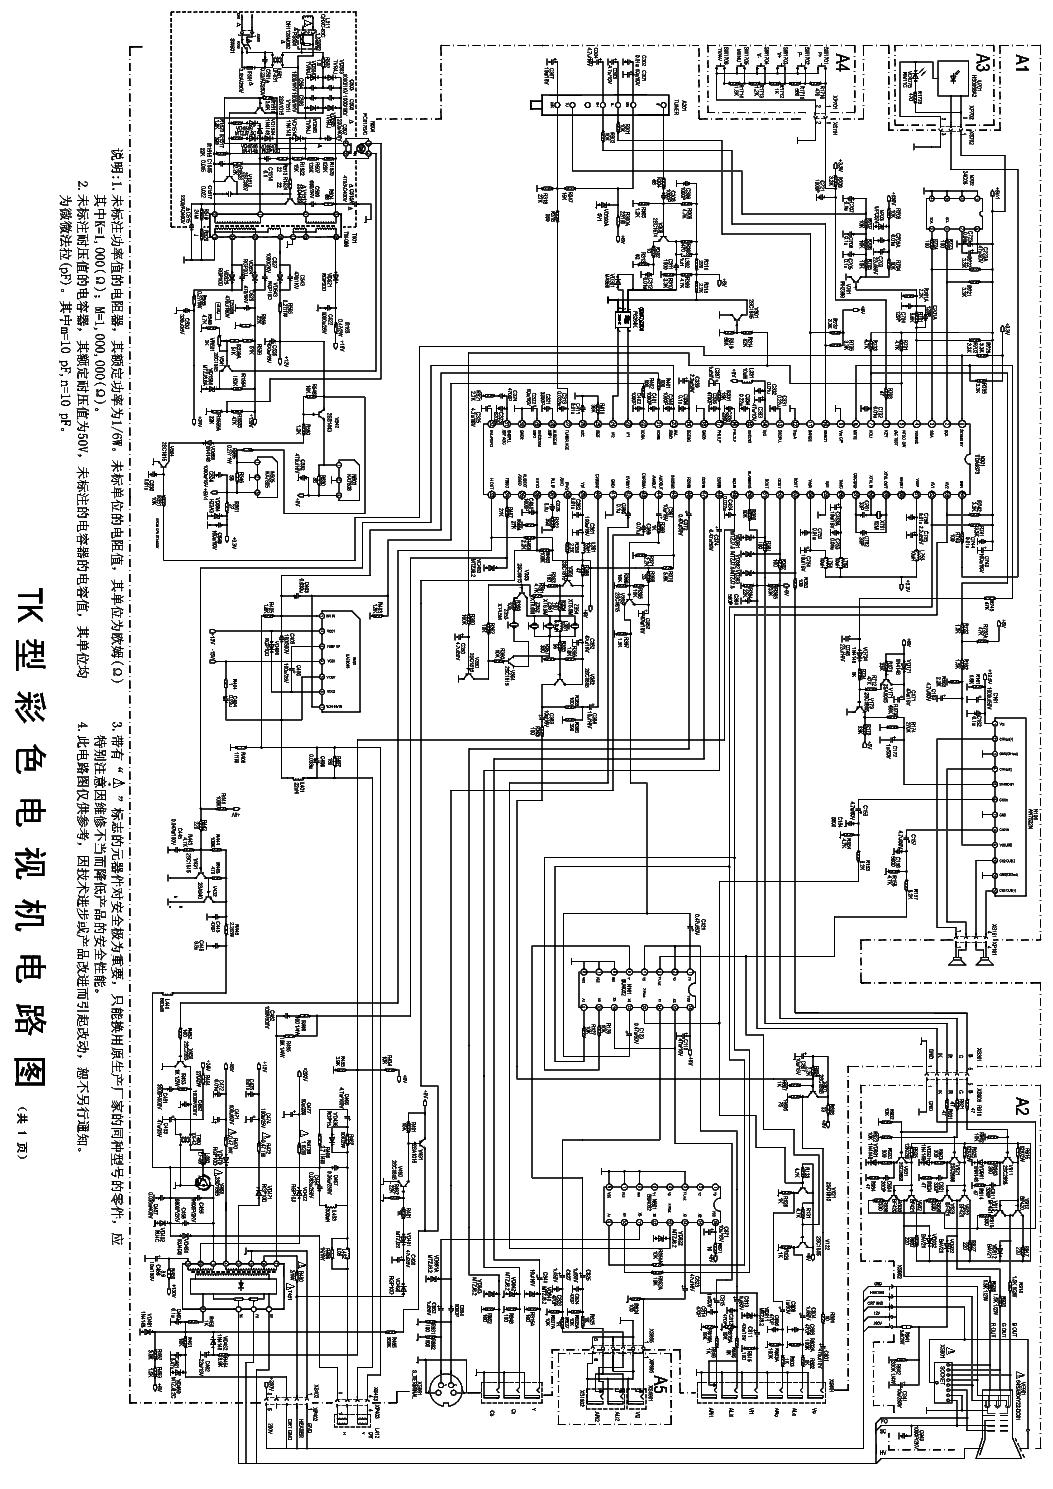 xoceco tk2153 - tda9373   la78045   an7522n